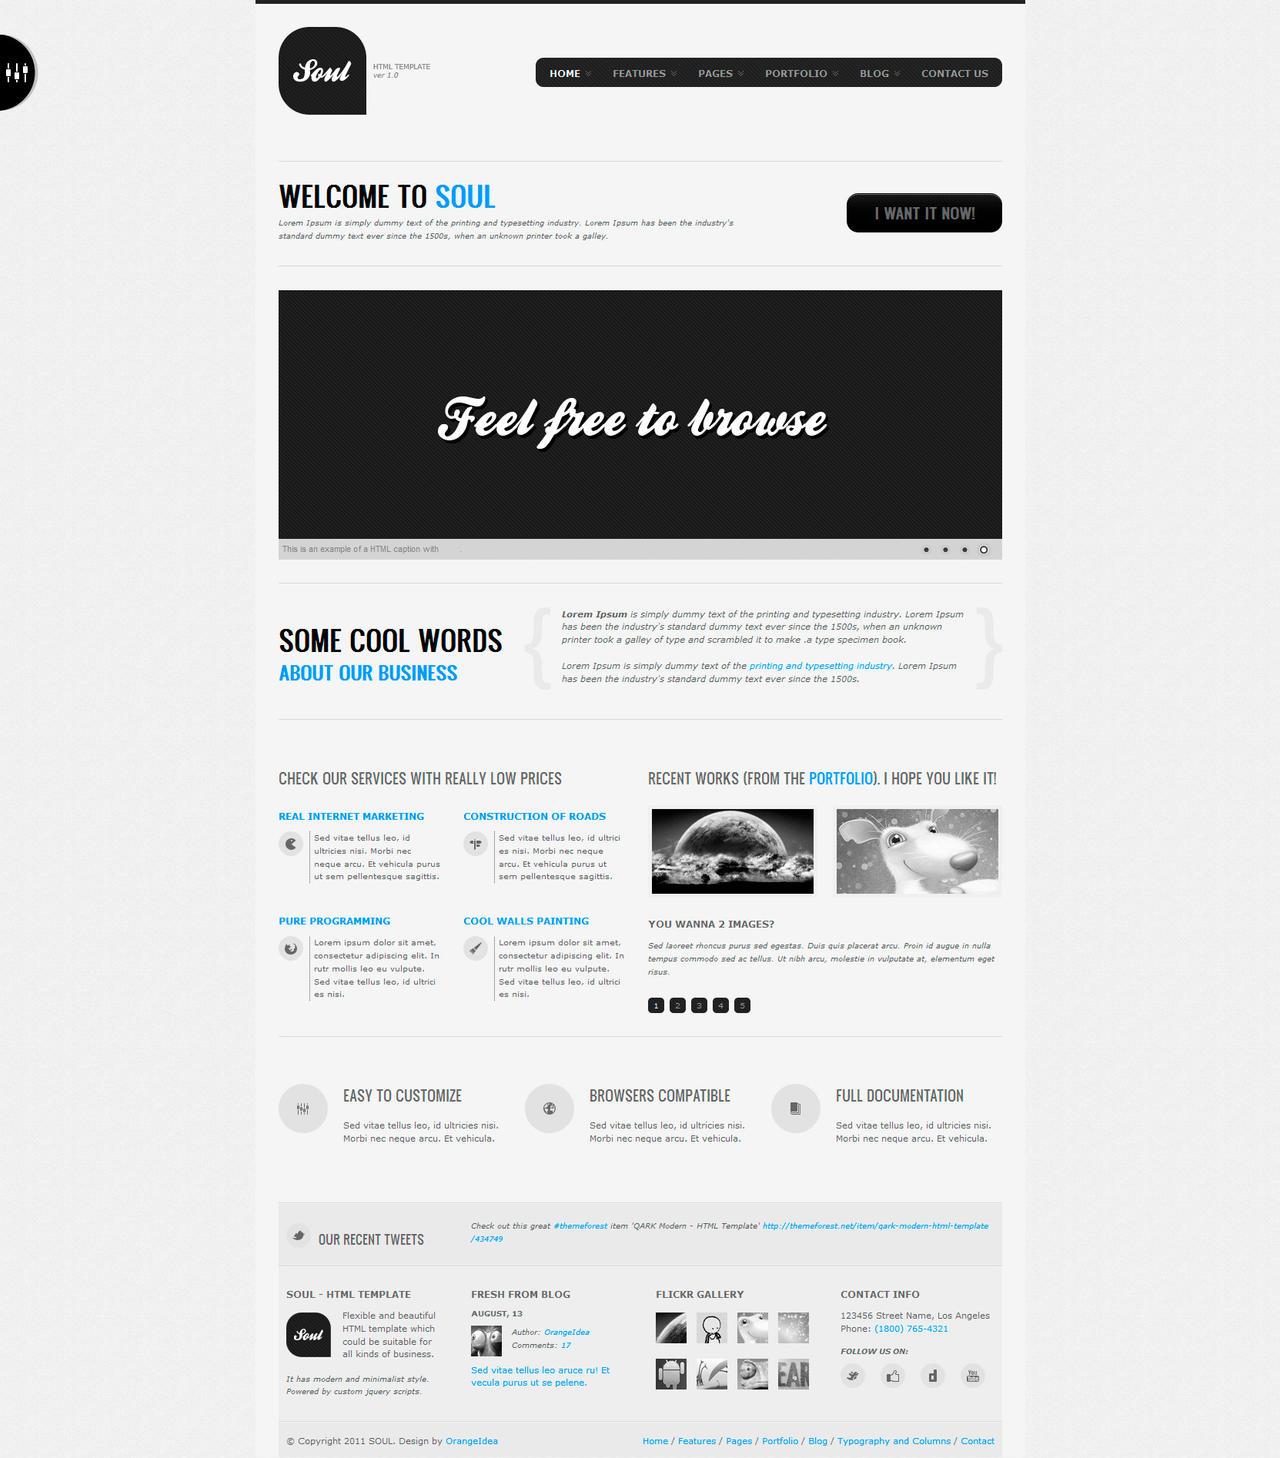 SOUL - Premium HTML Template by OrangeIdea